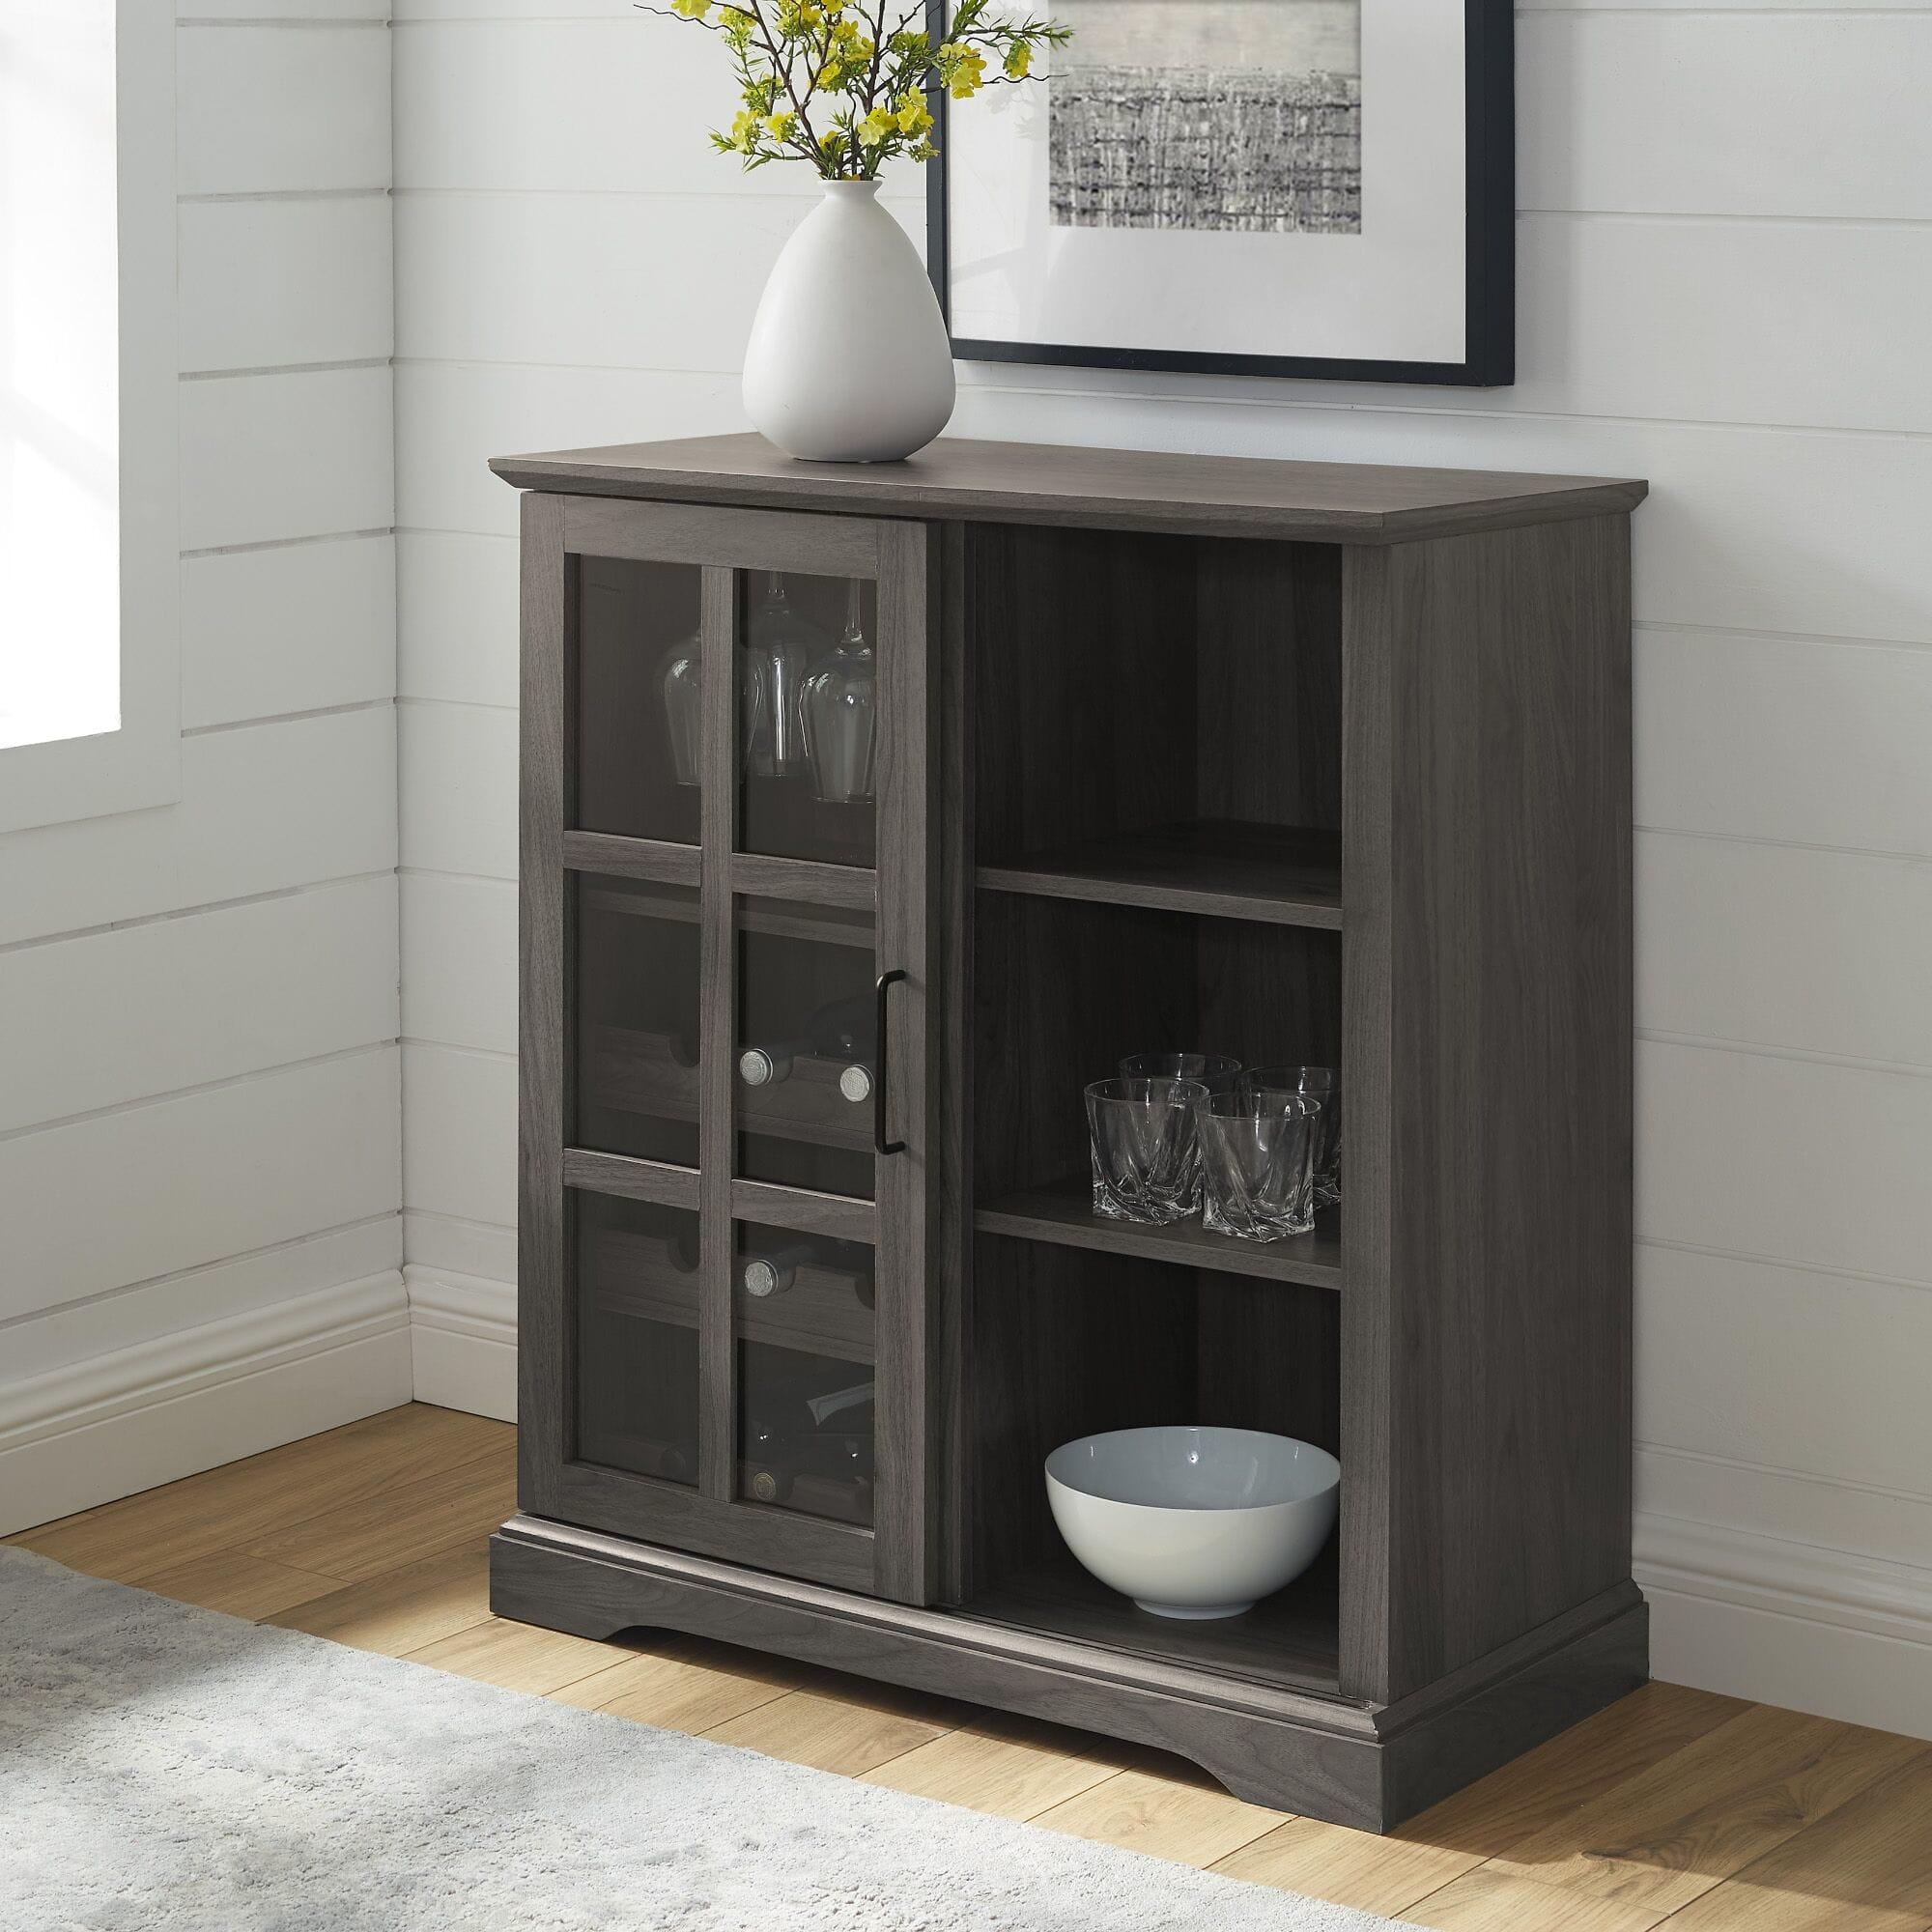 36 Inch Sliding Glass Door Bar Cabinet Slate Grey By Walker Edison